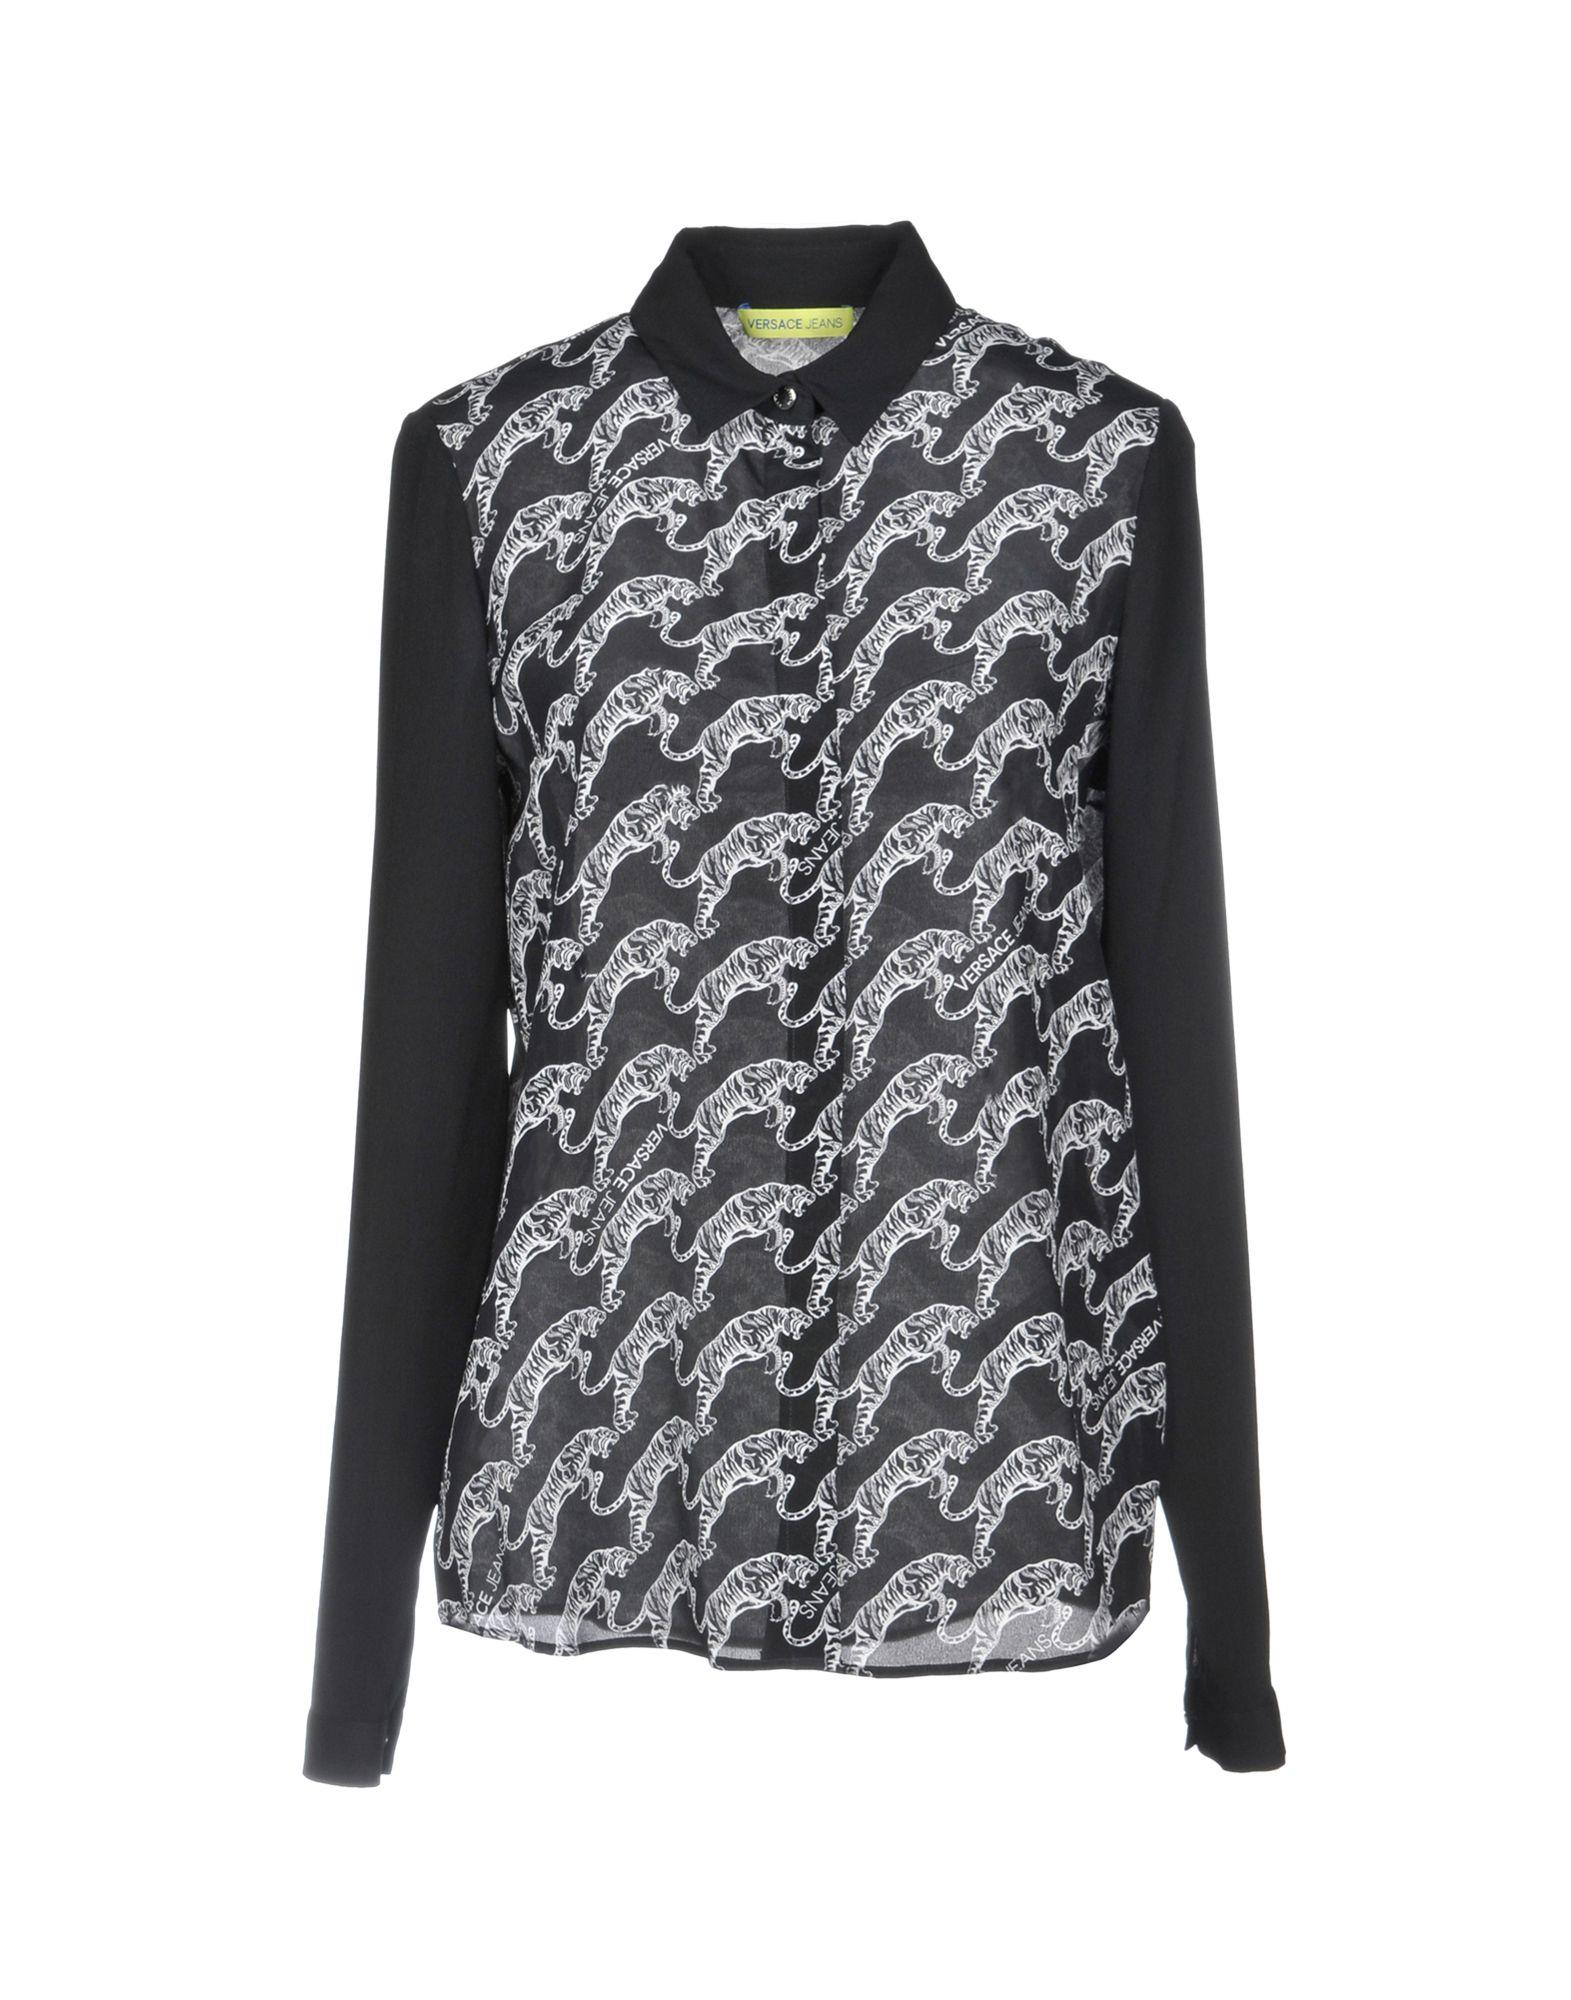 Camicie  E bluse Fantasia Versace Jeans donna - - 38758063QG  das beste Online-Shop-Angebot